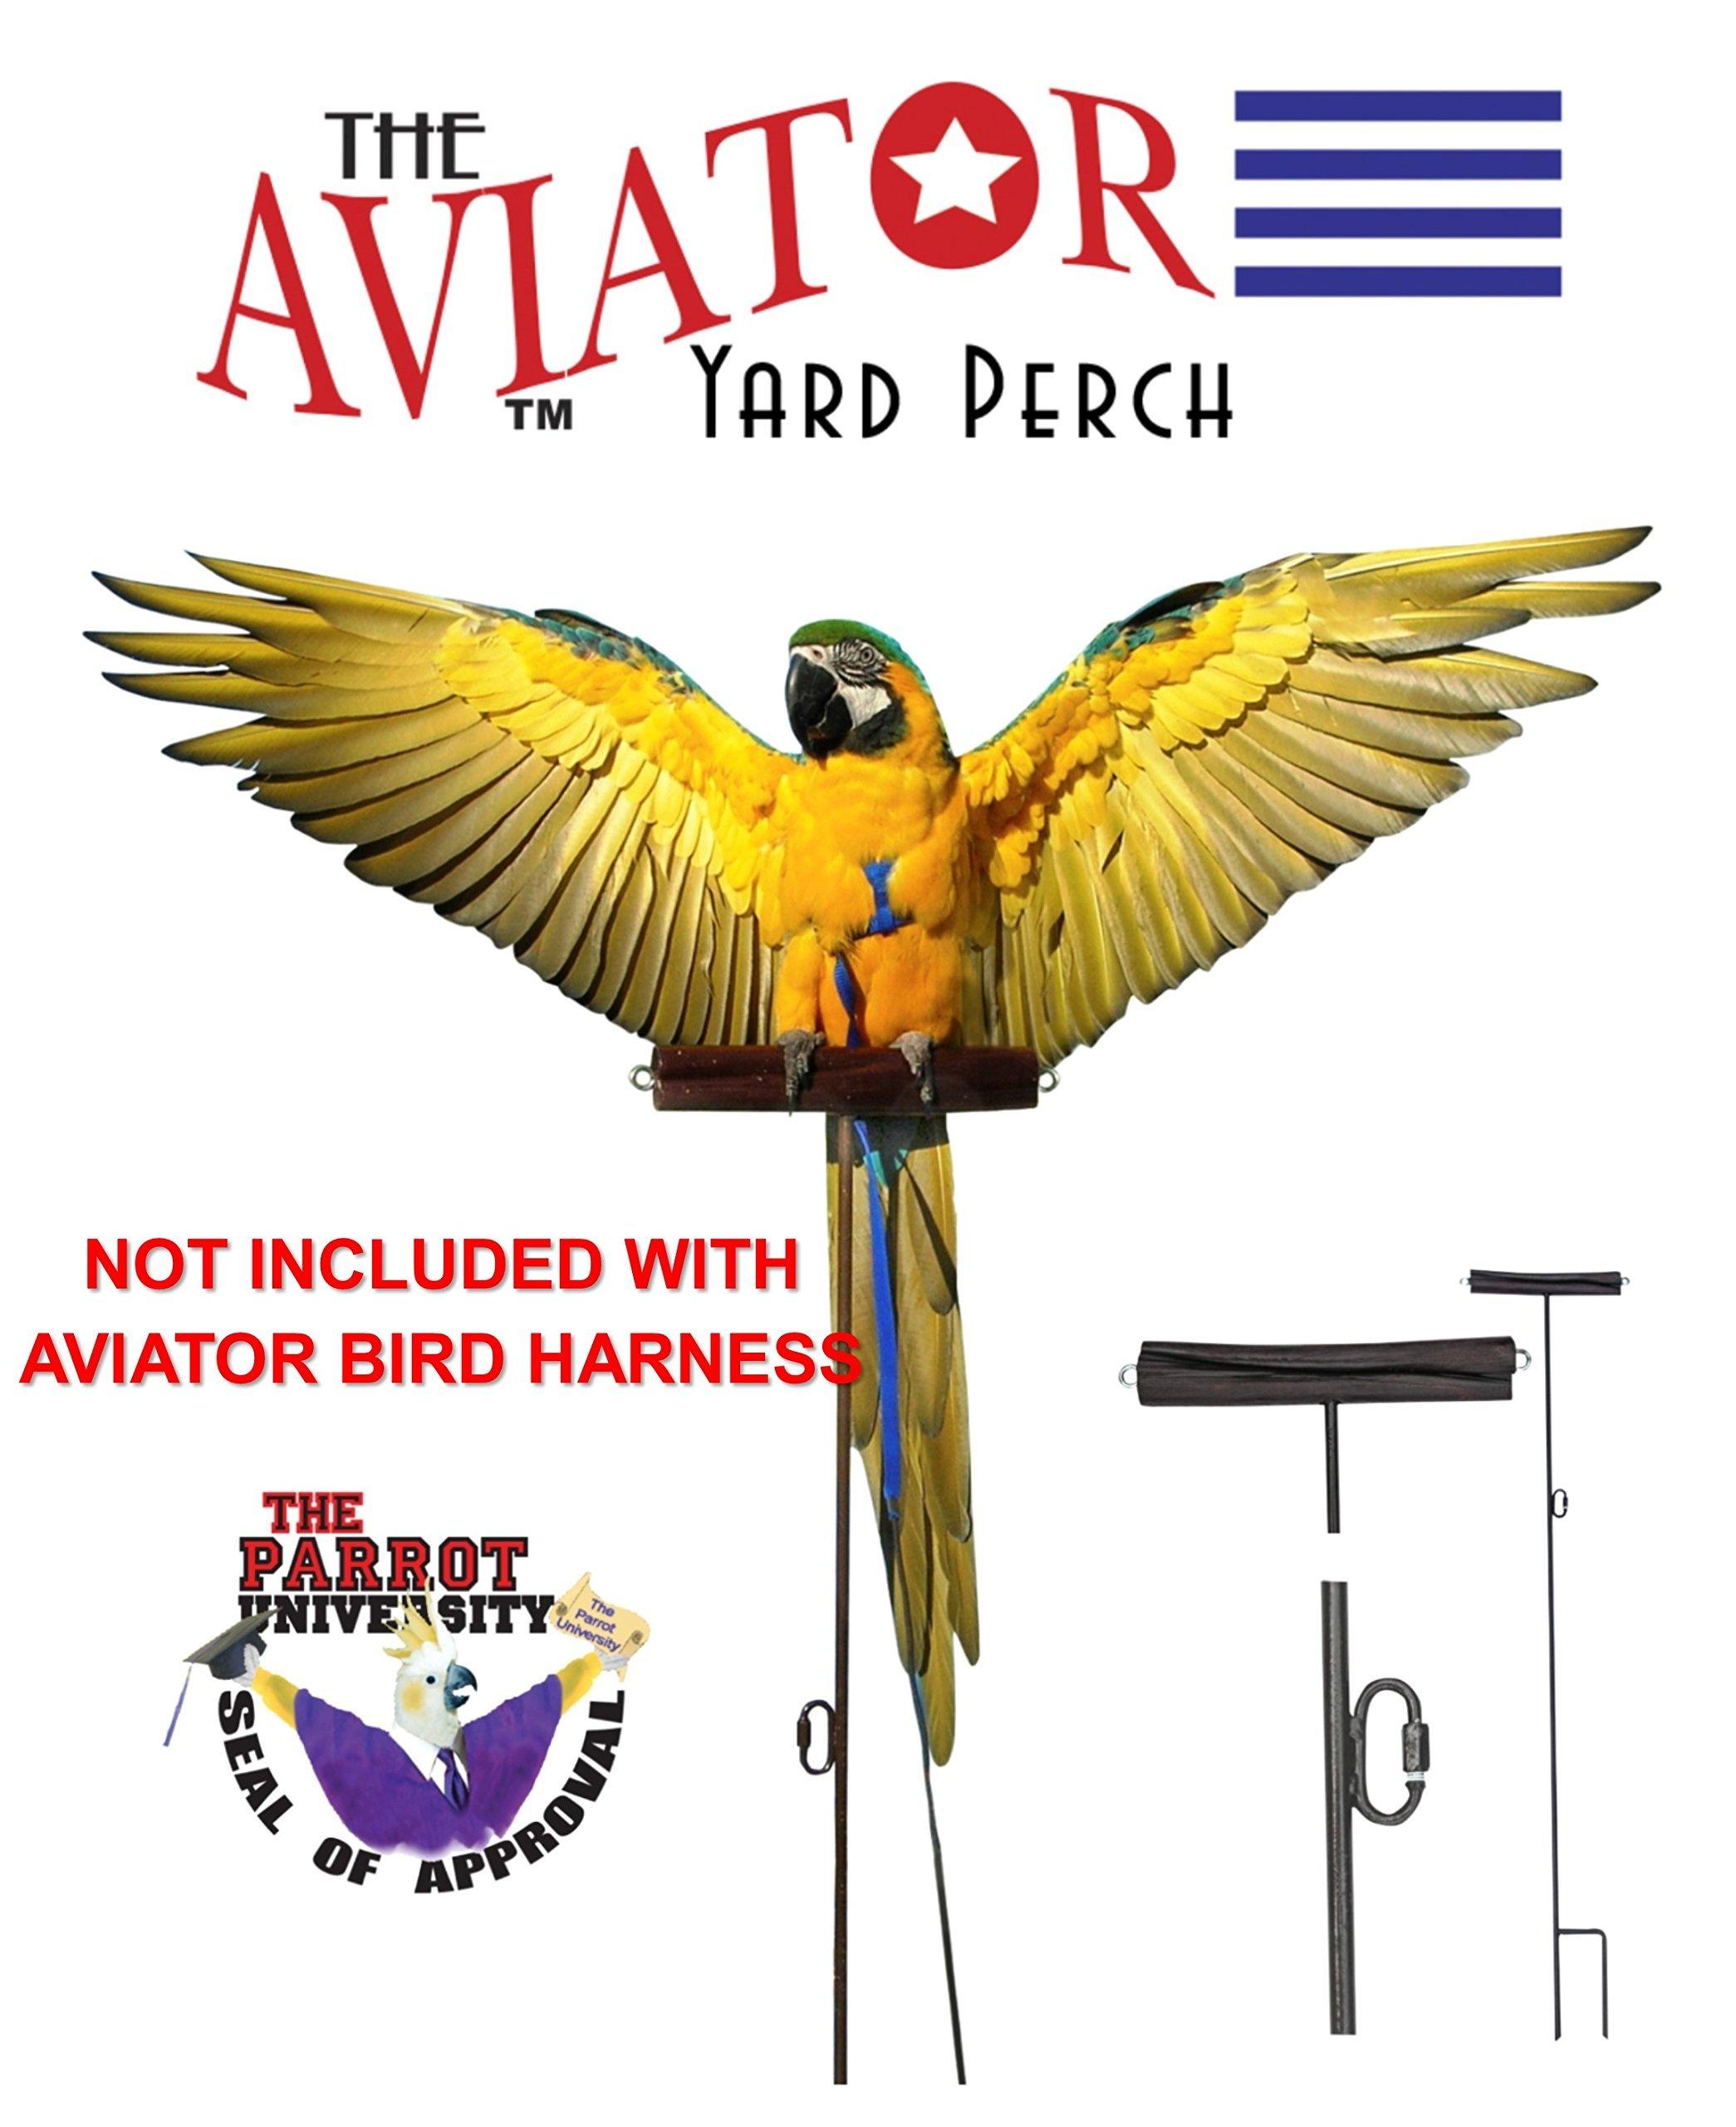 The AVIATOR Pet Bird Harness and Leash: Petite Black by The AVIATOR